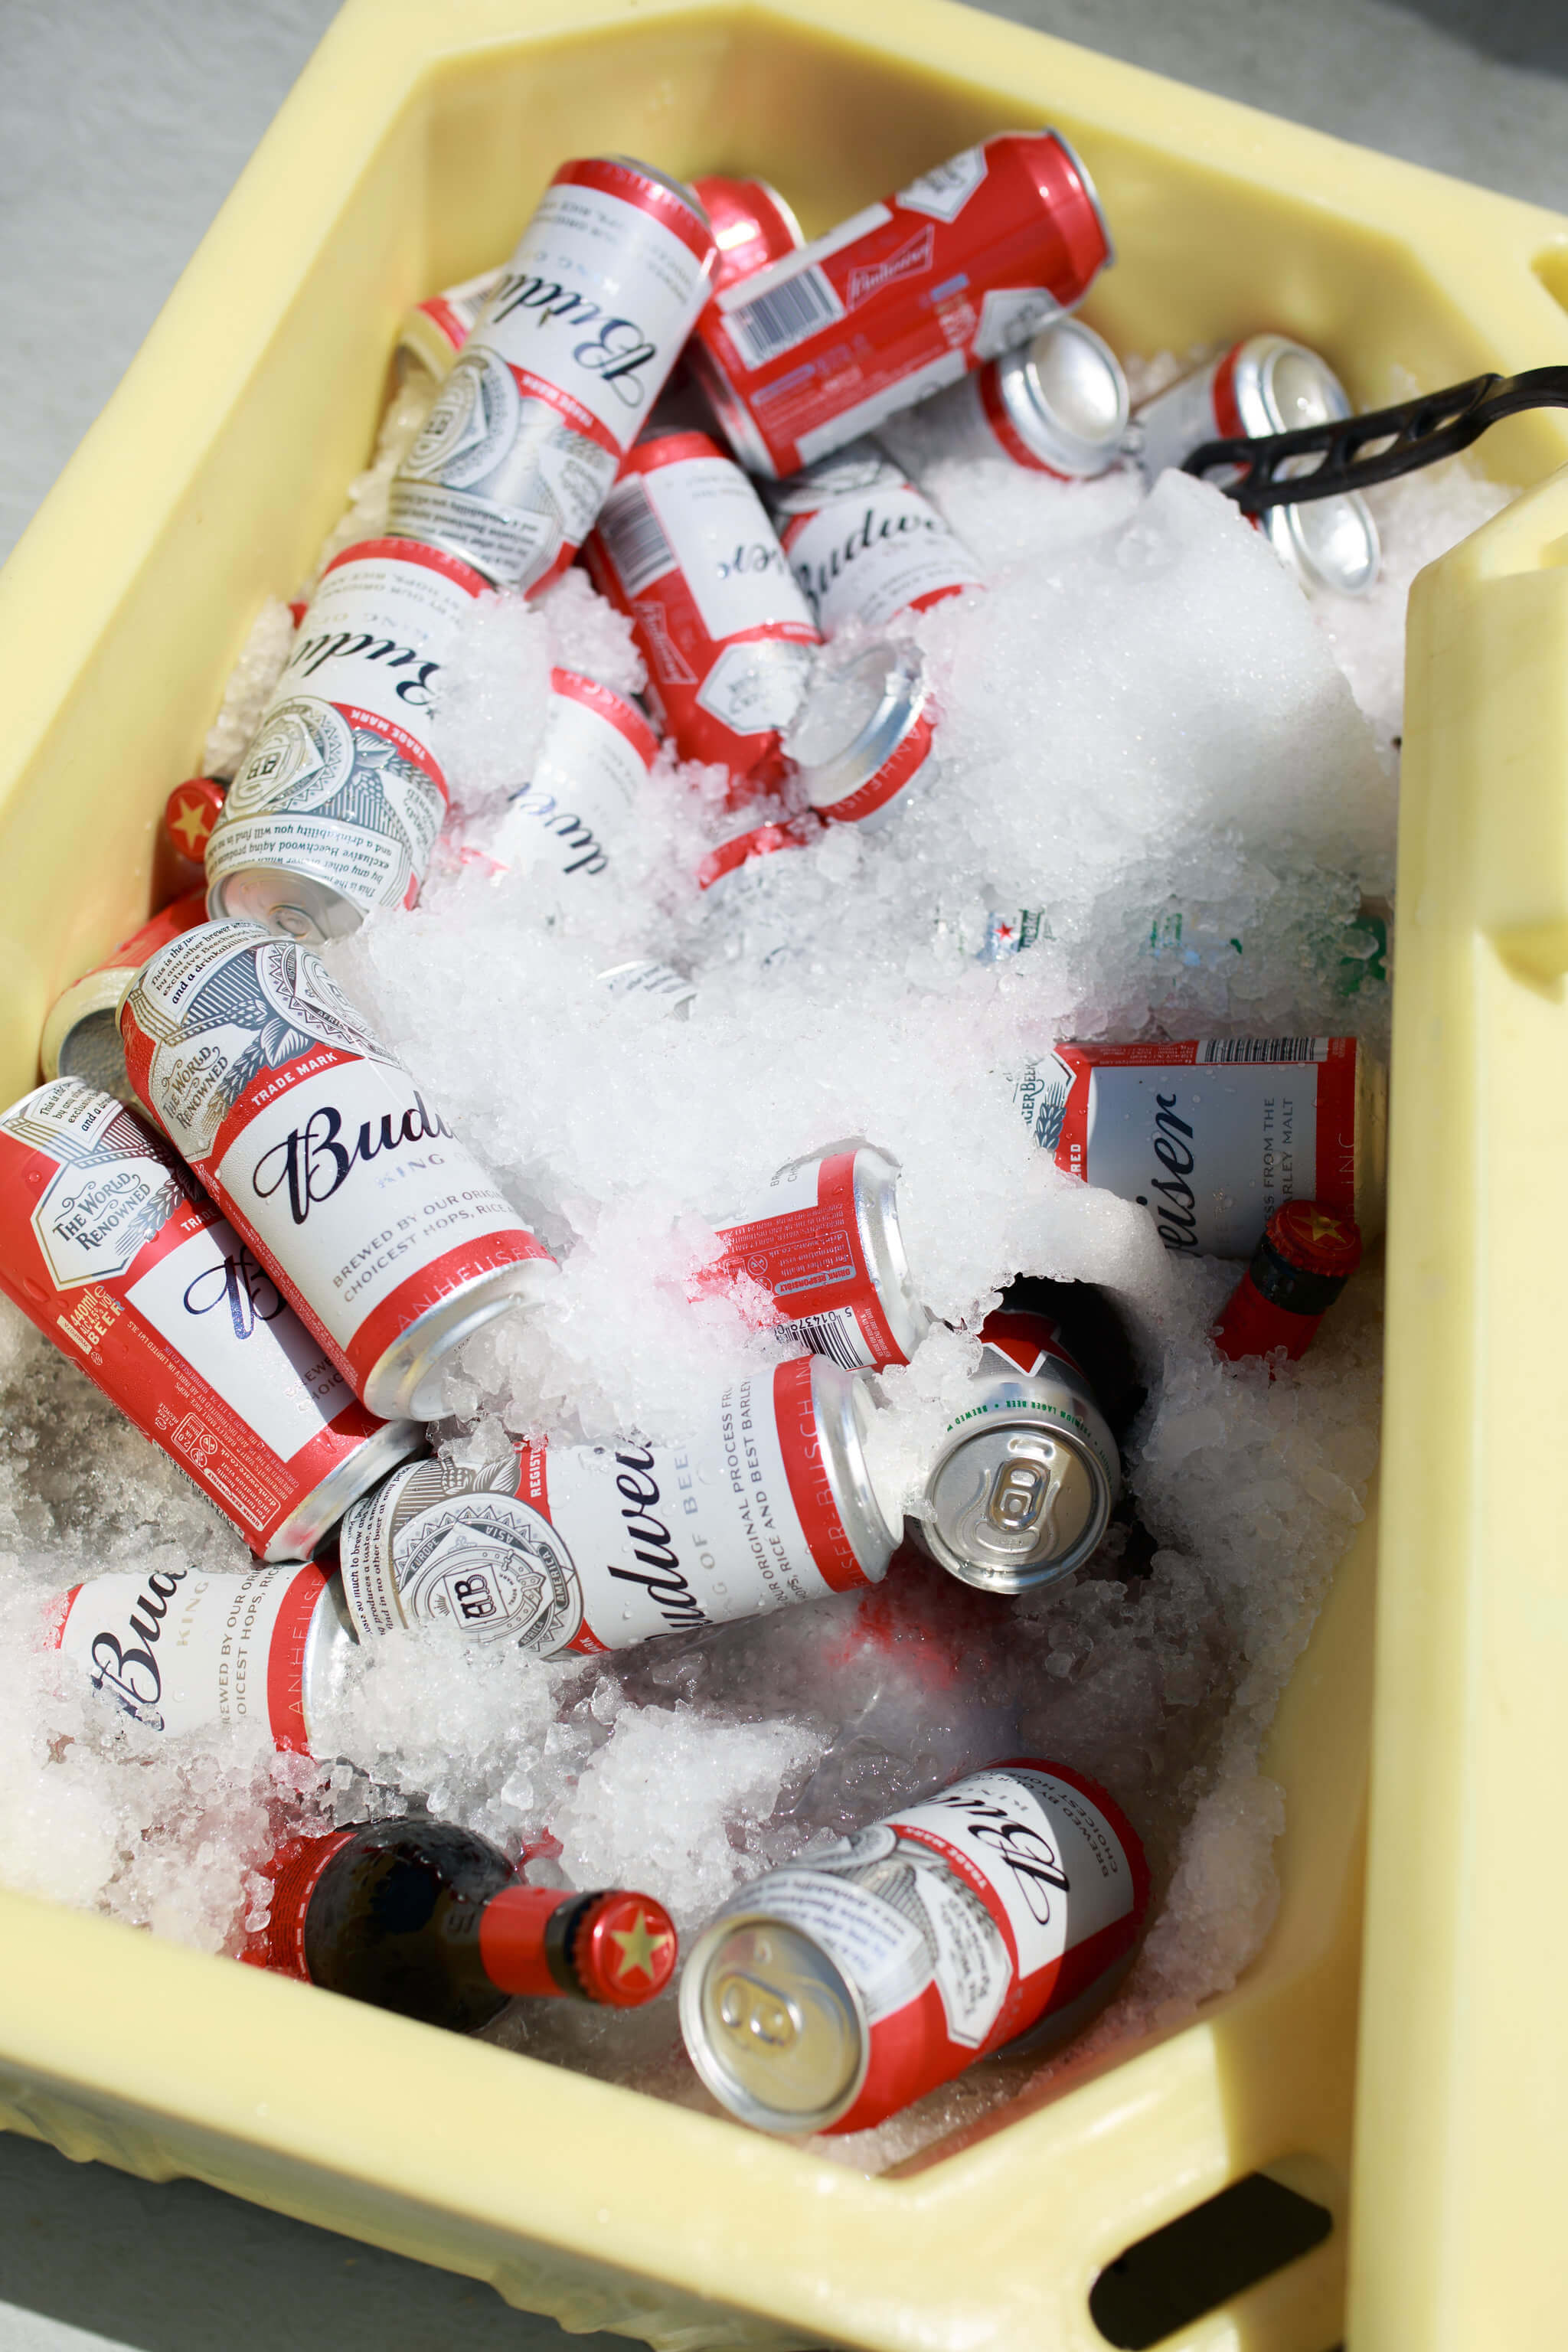 Free beer in an ice bucket at outdoor  wedding